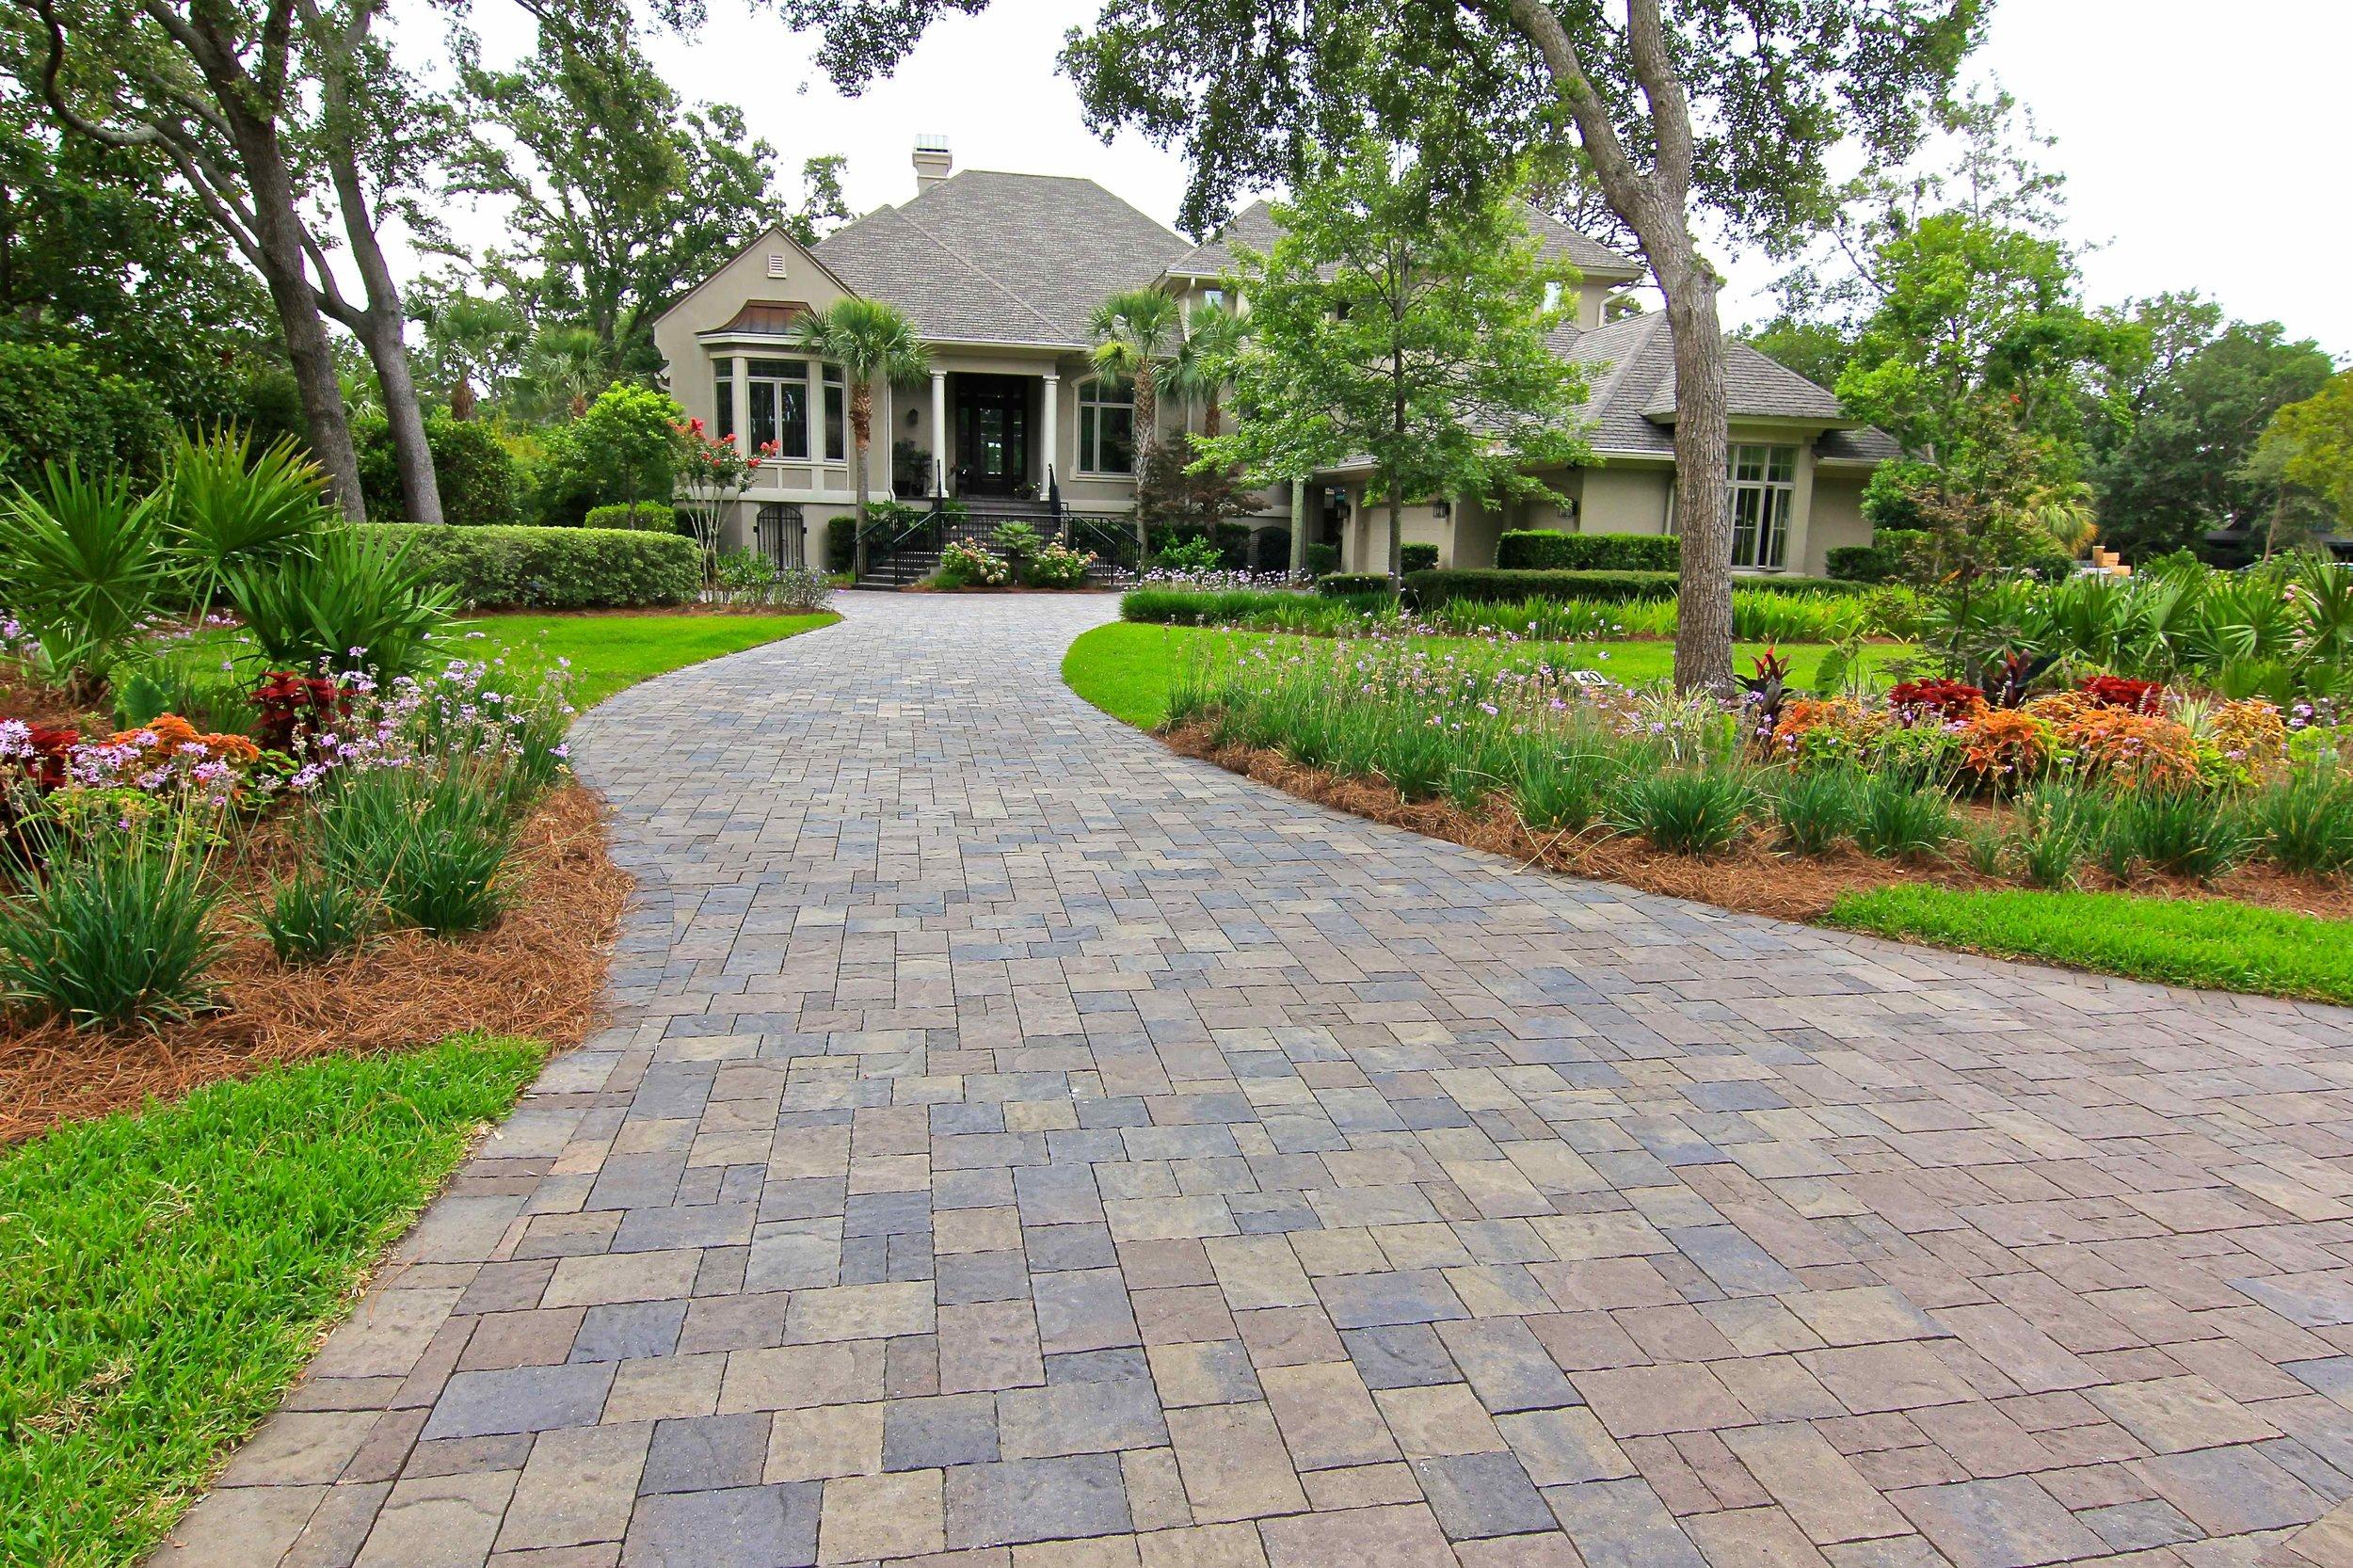 This driveway has a more subtle paver edge.